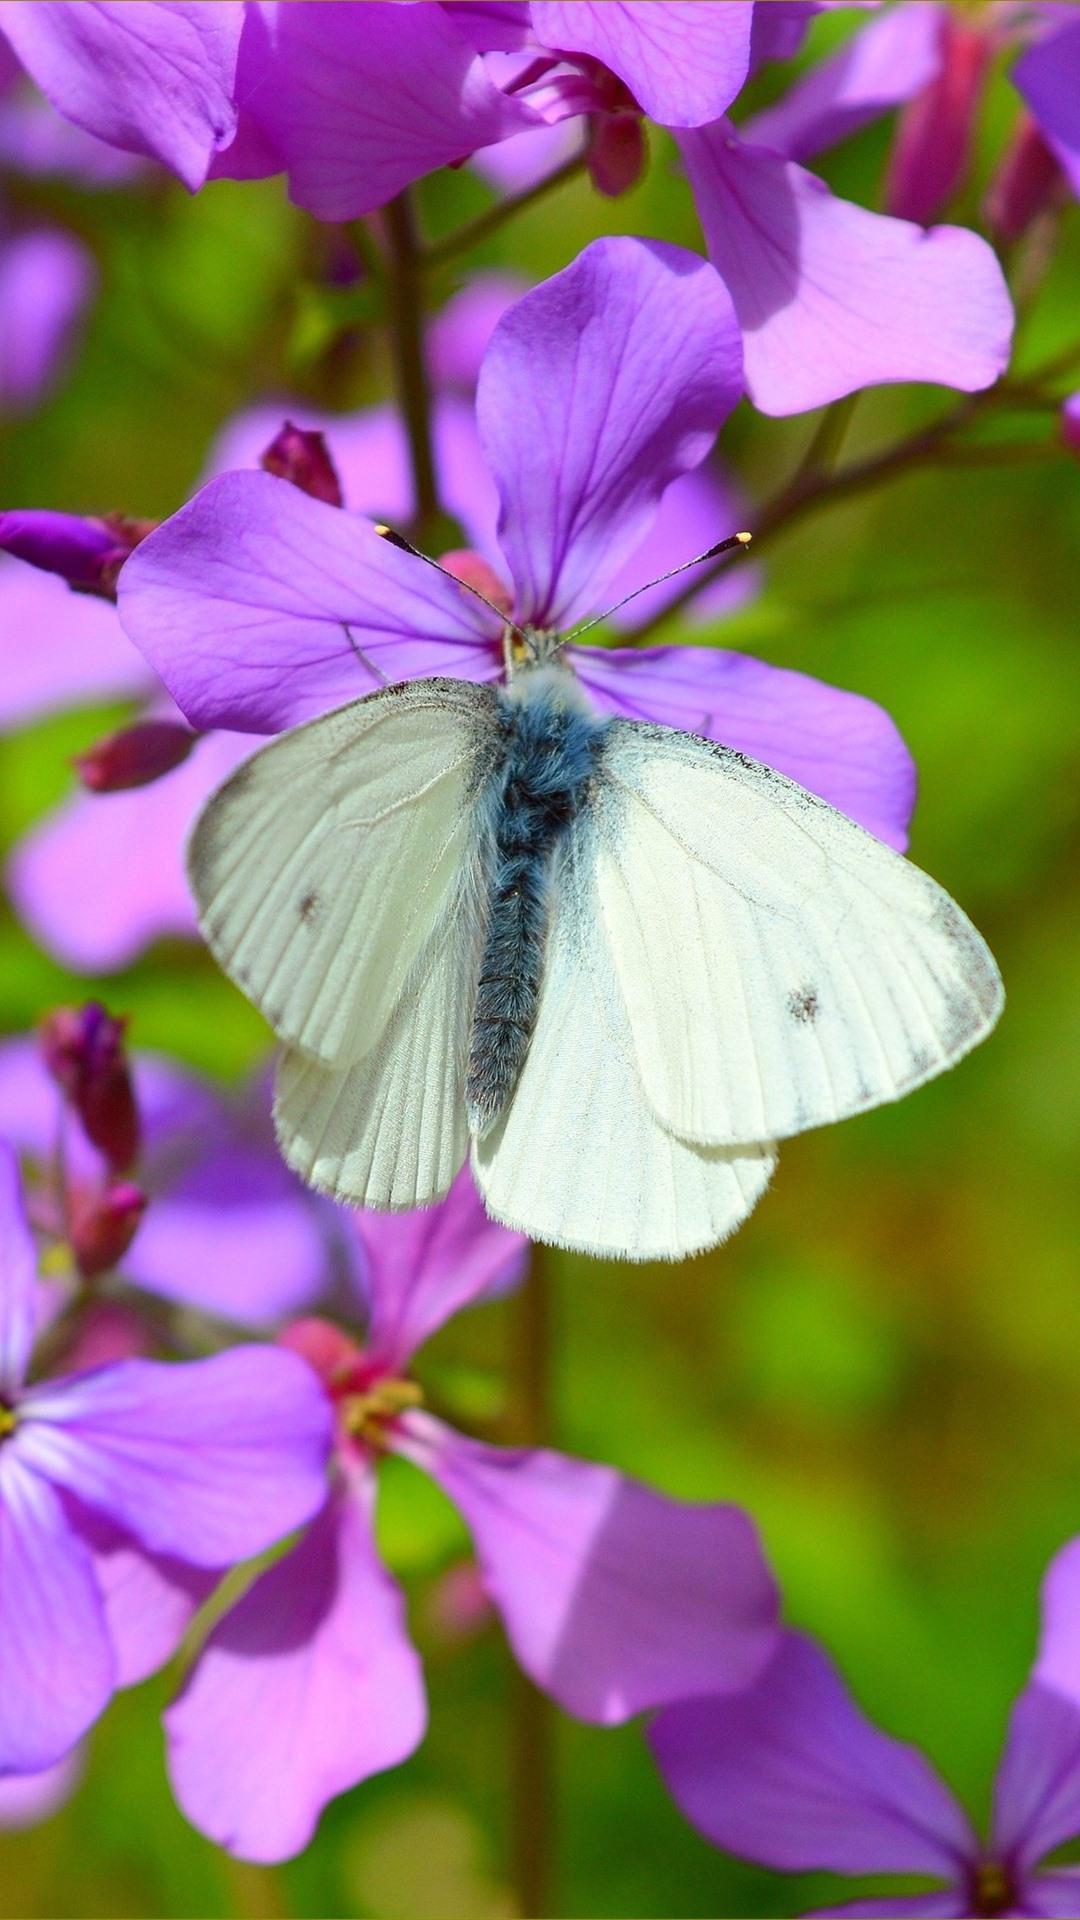 Fondos de pantalla mariposa blanca